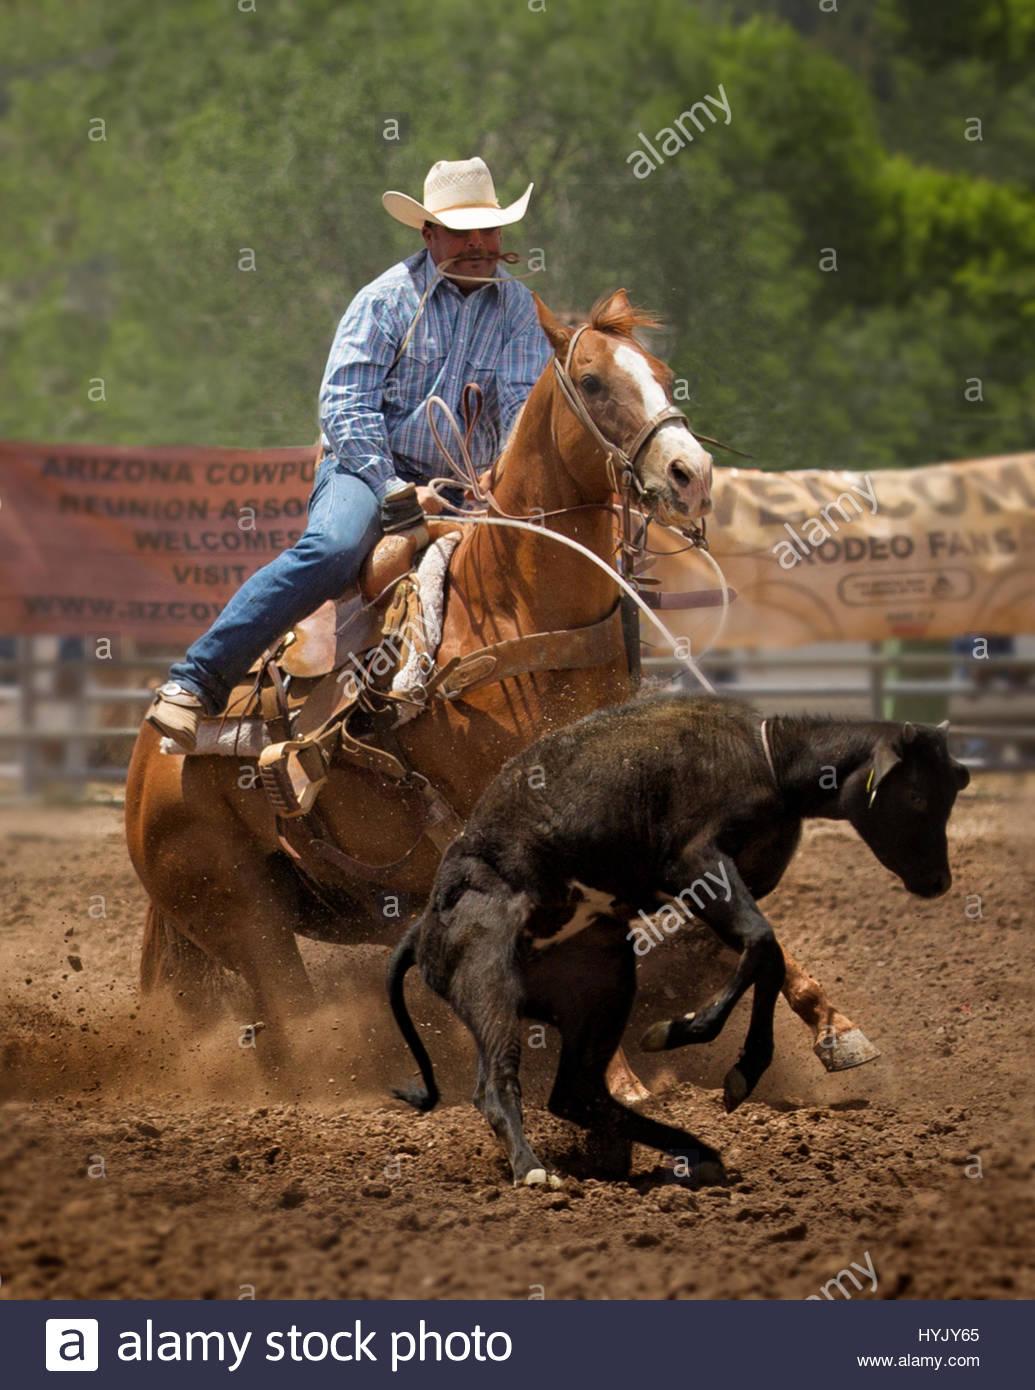 Arizona Cowboy Rodeo Stock Photos Amp Arizona Cowboy Rodeo